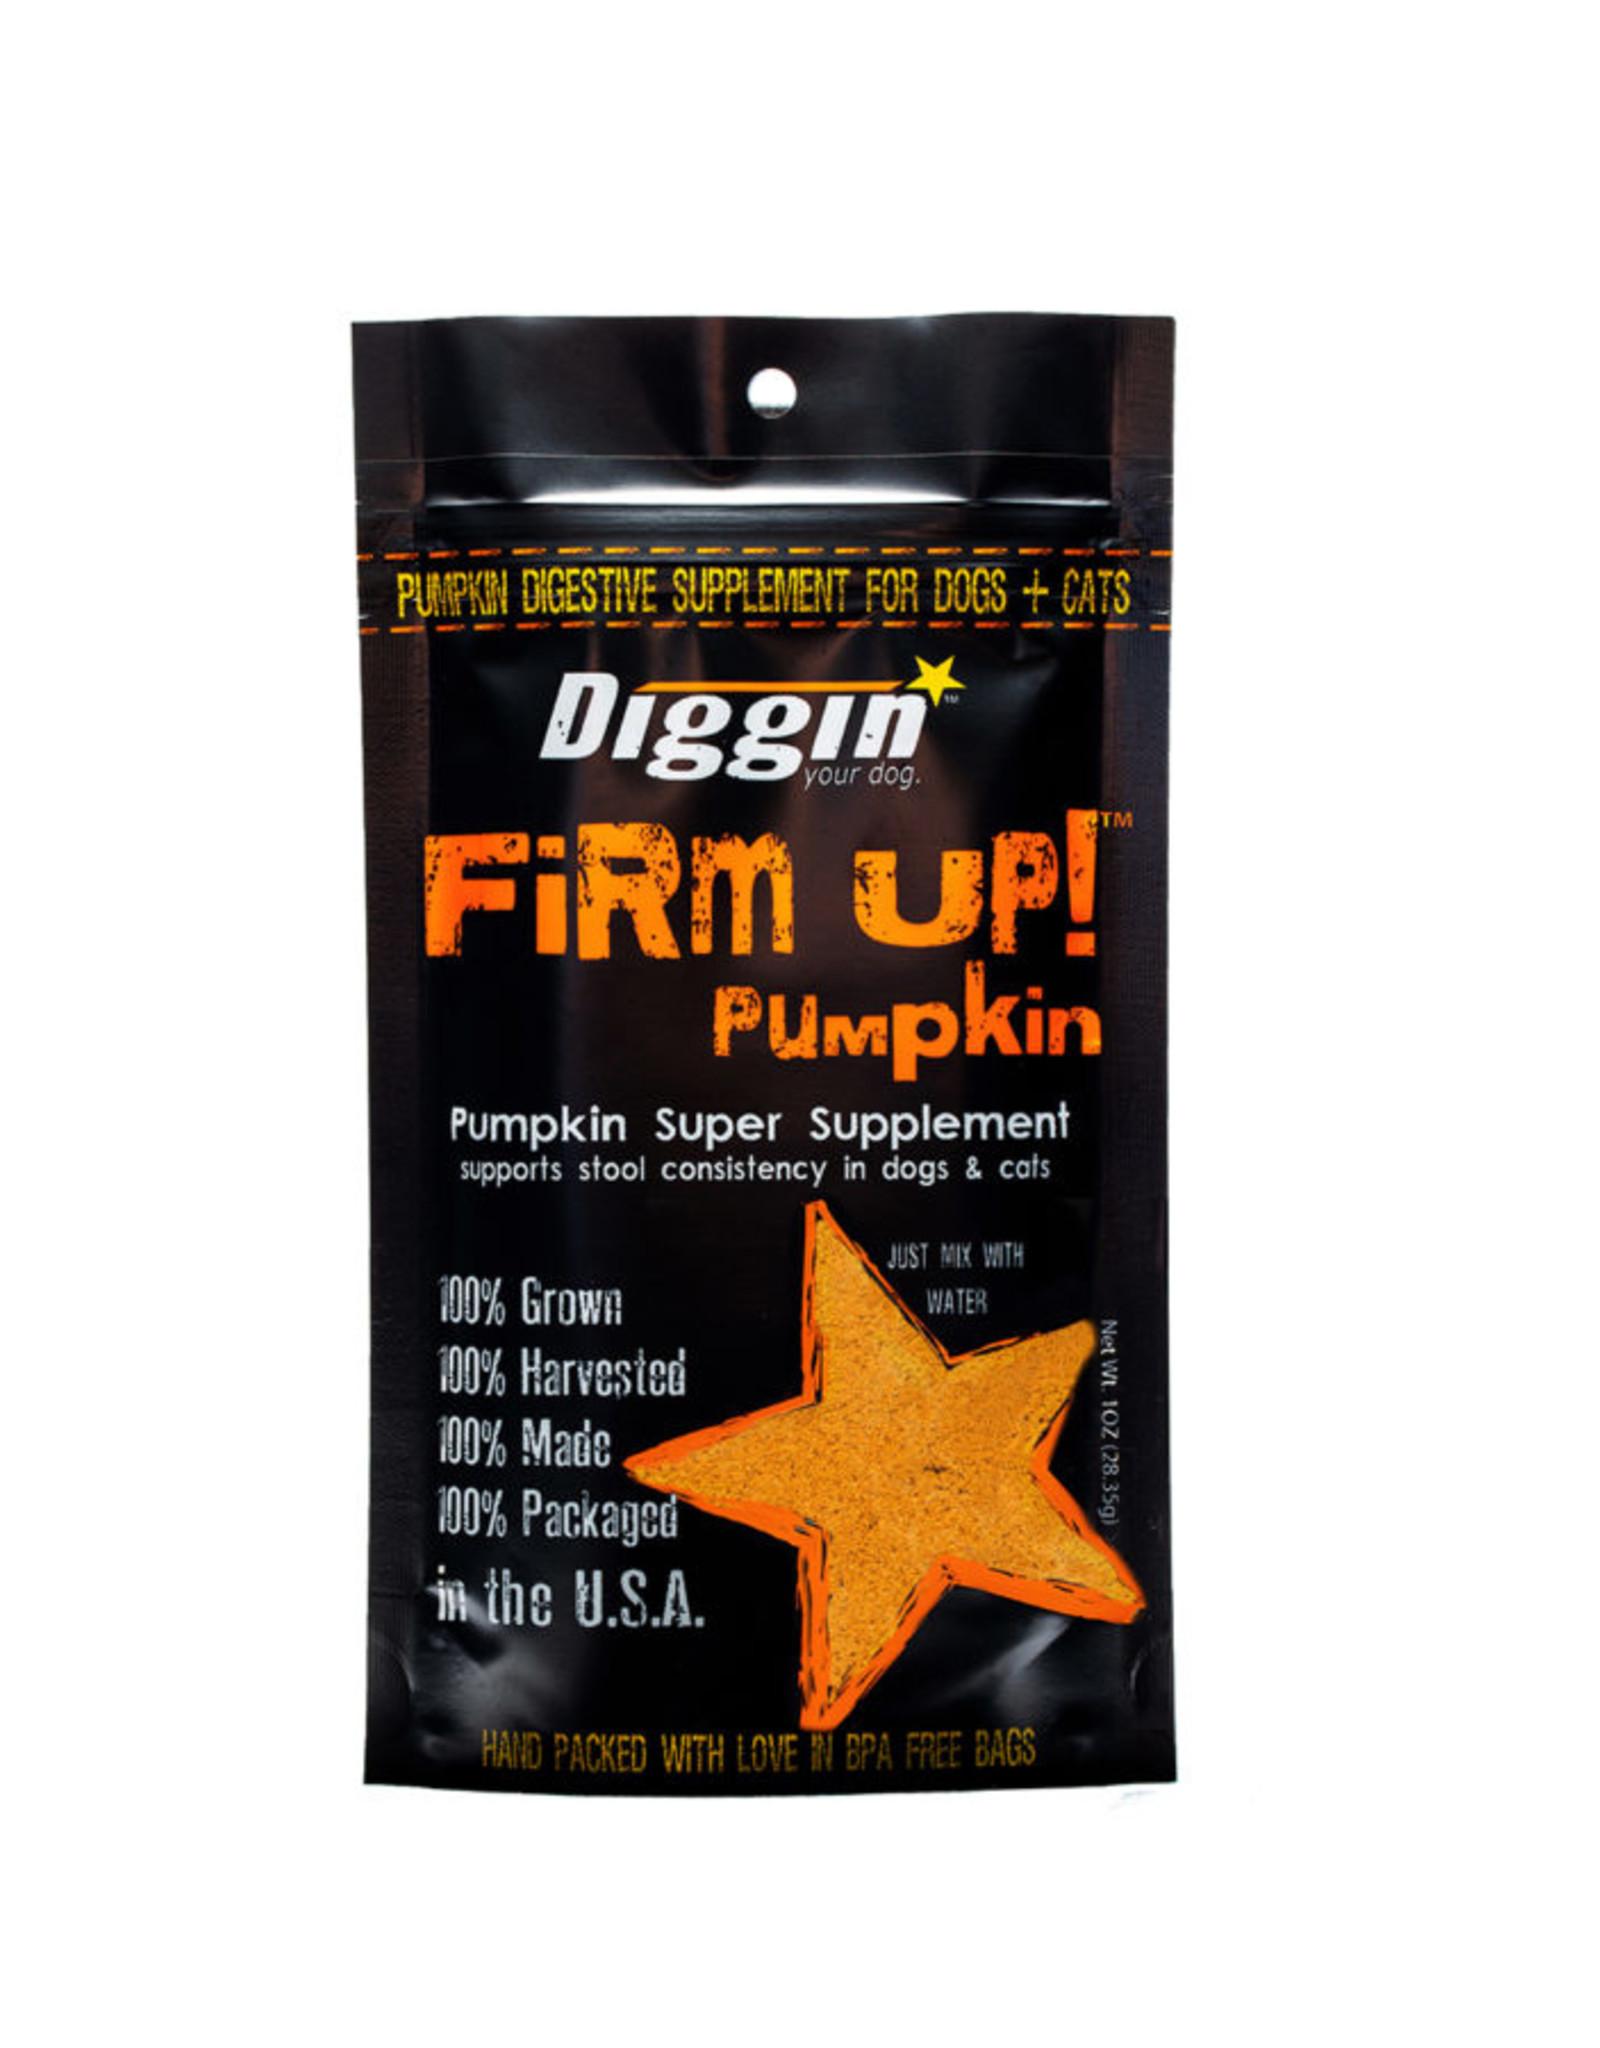 Diggin Your Dog Firm Up Pumpkin 1oz